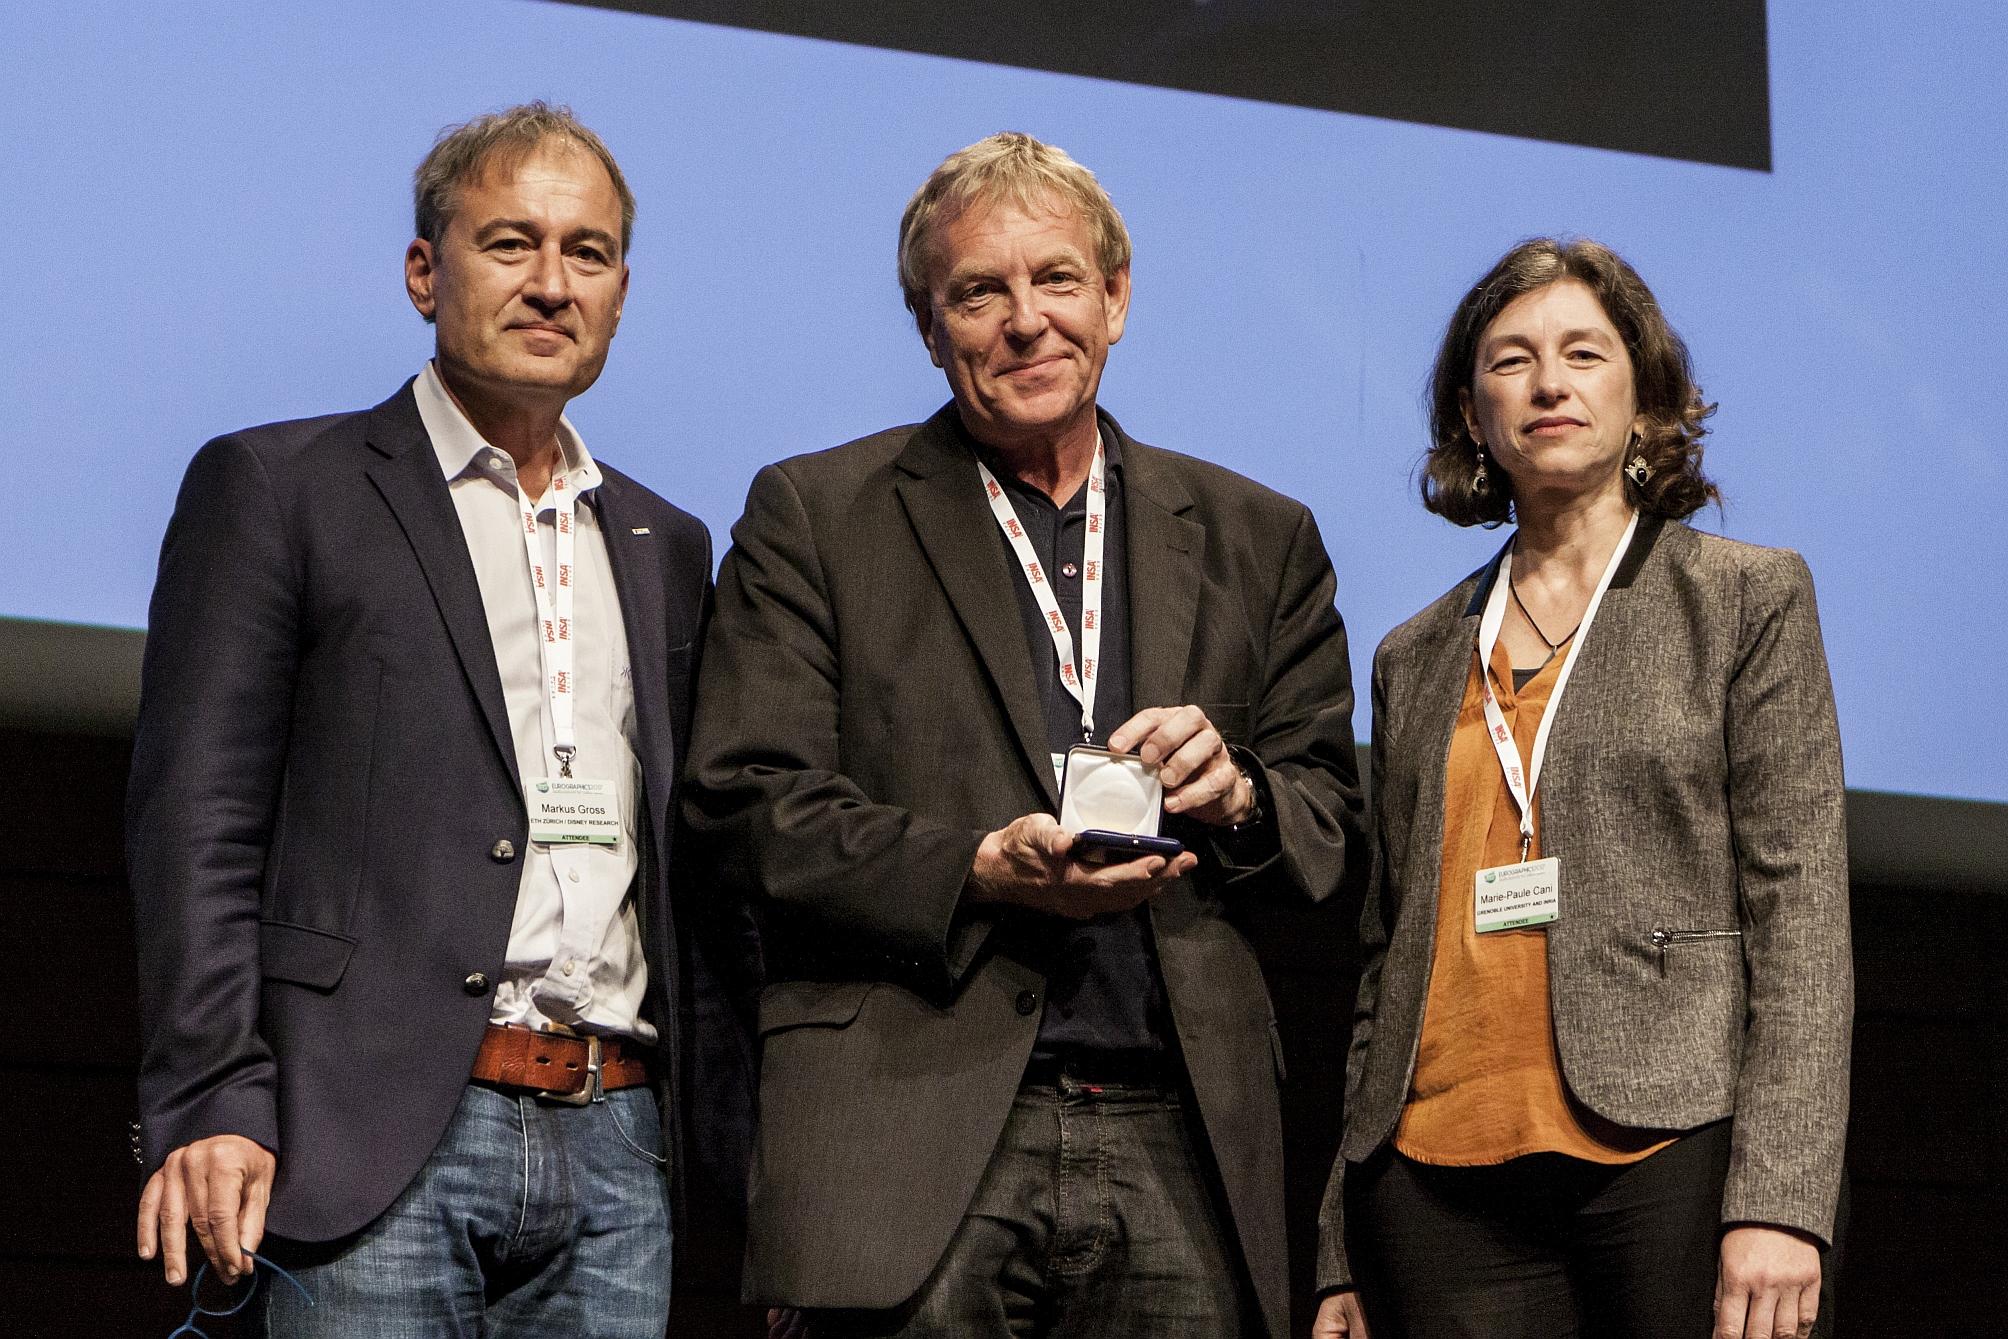 Eurographics-Medaille in Gold für Professor Hans-Peter Seidel